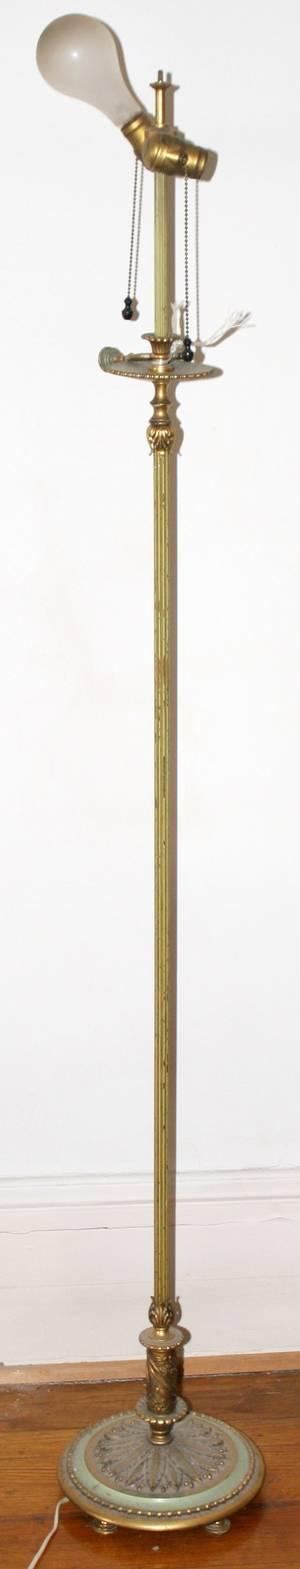 031537 BRONZE FLOOR LAMP EARLY 20TH C H 62